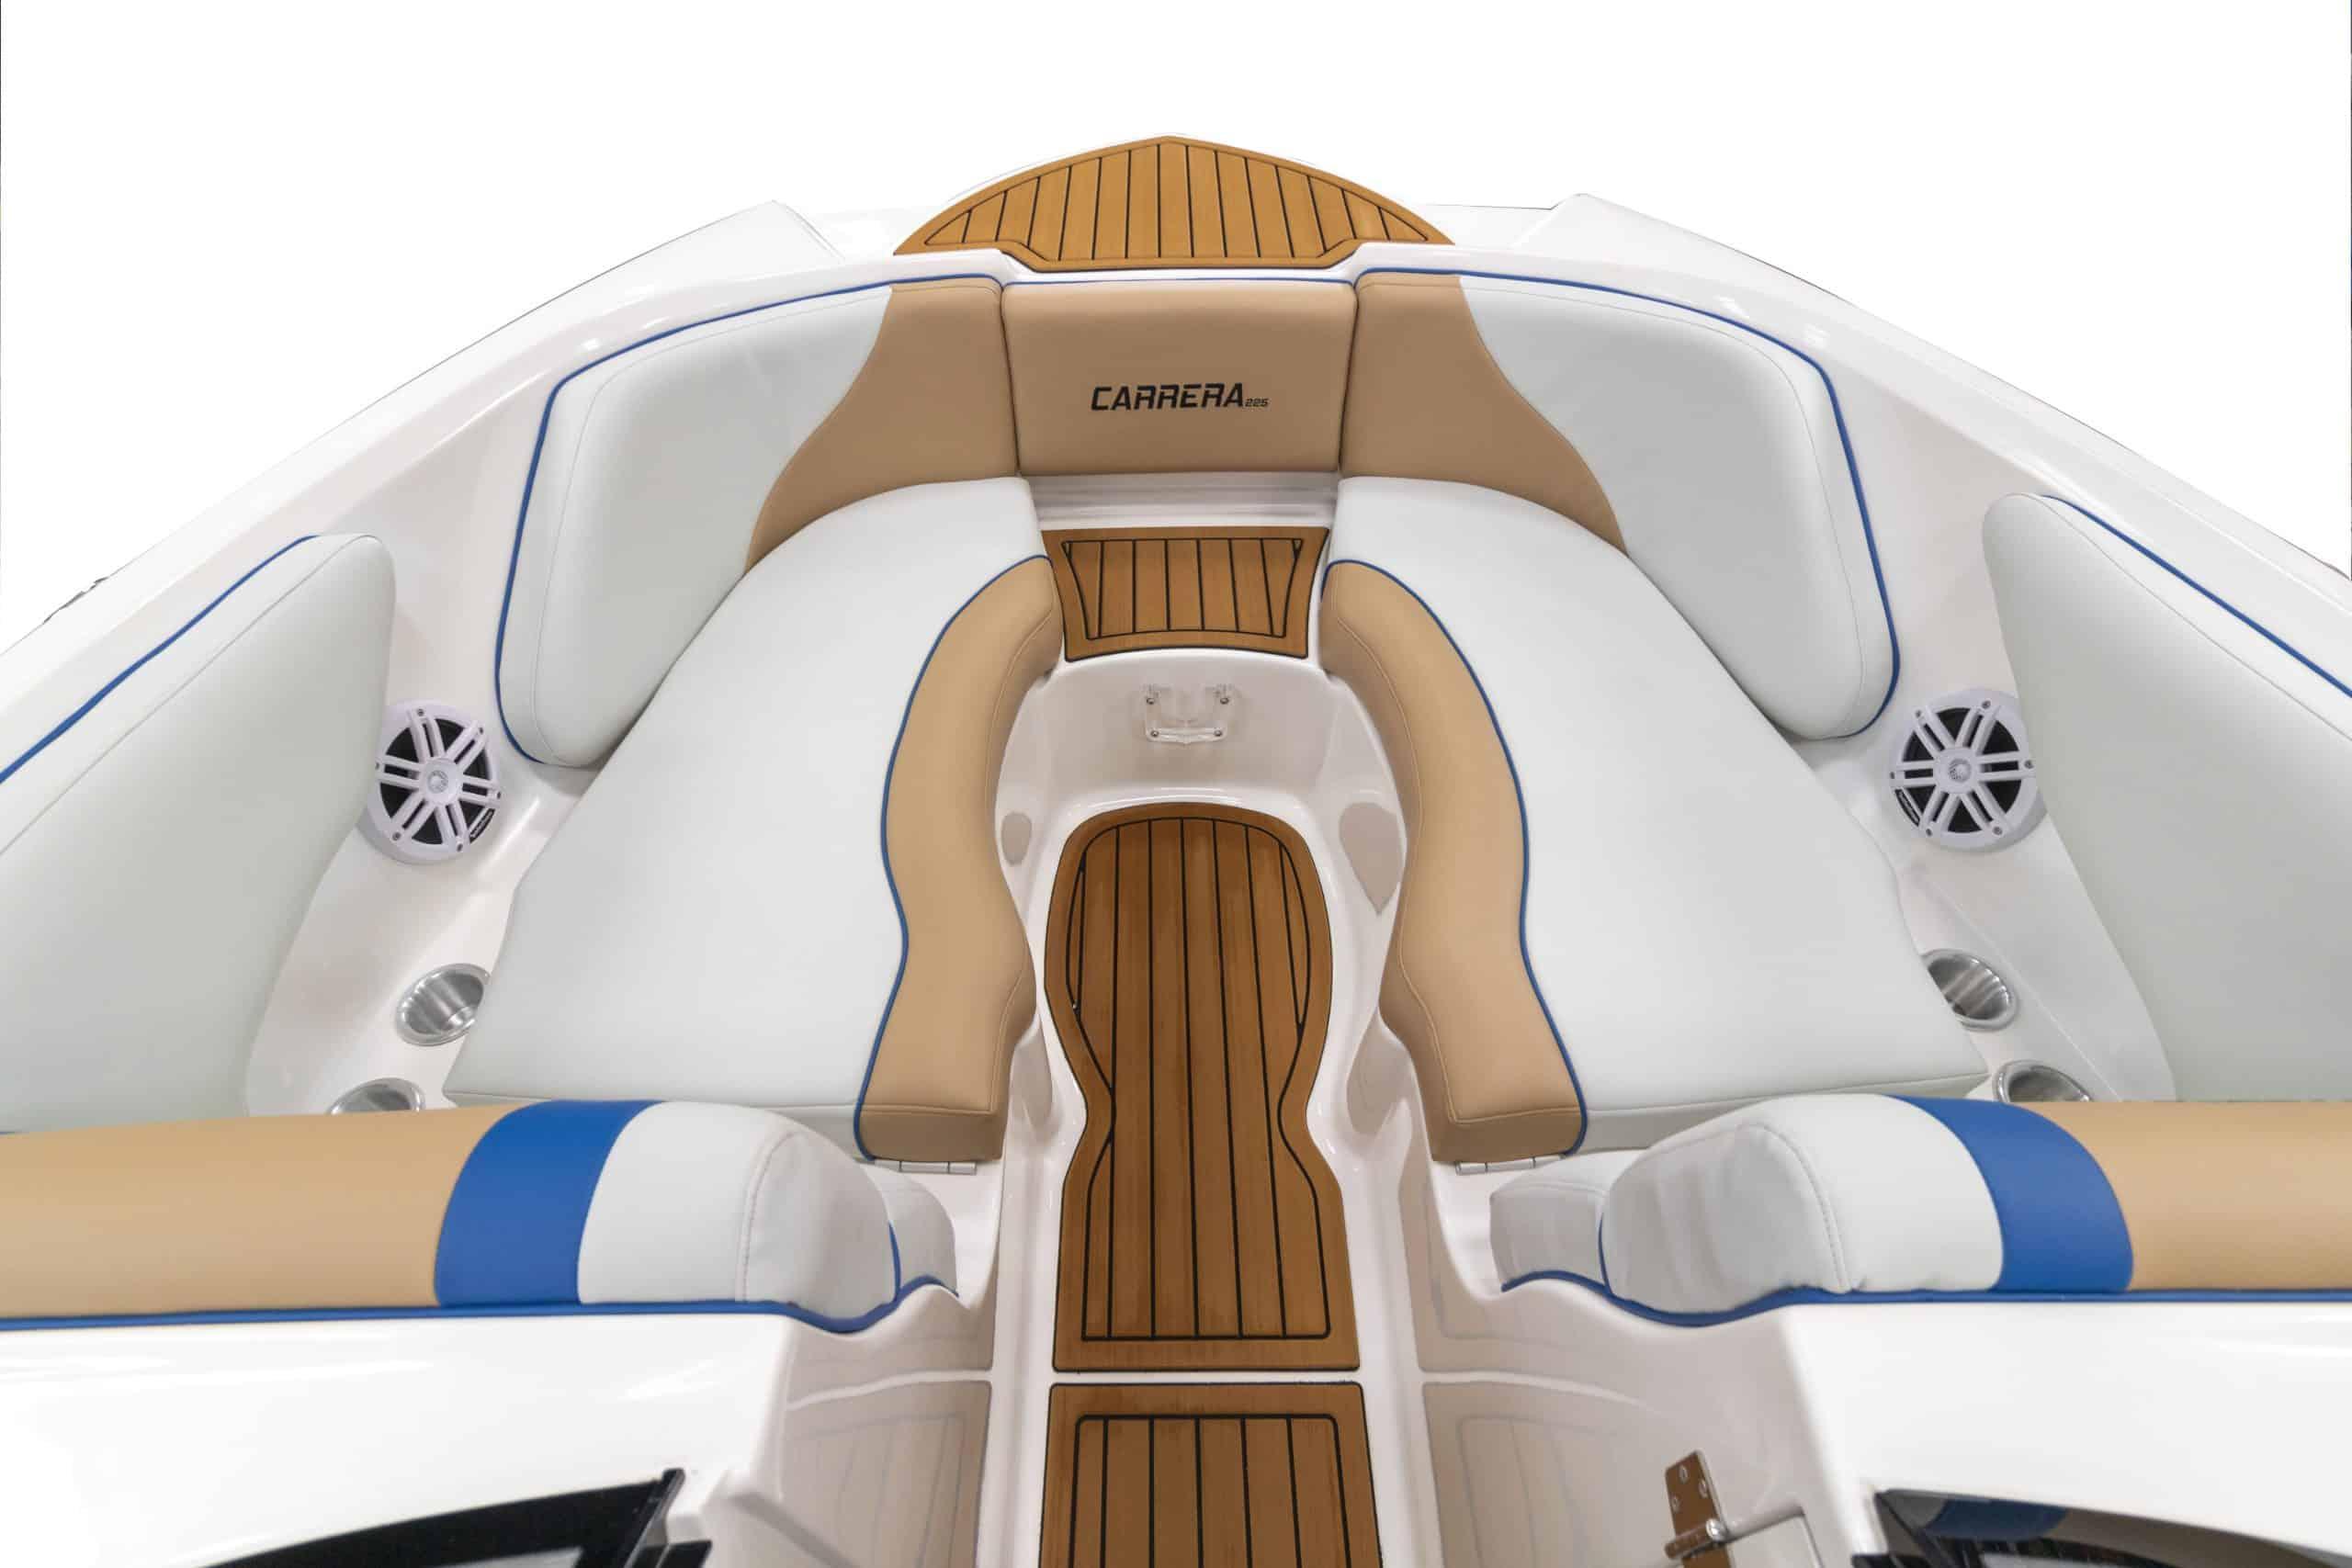 Carrera Boat Photography